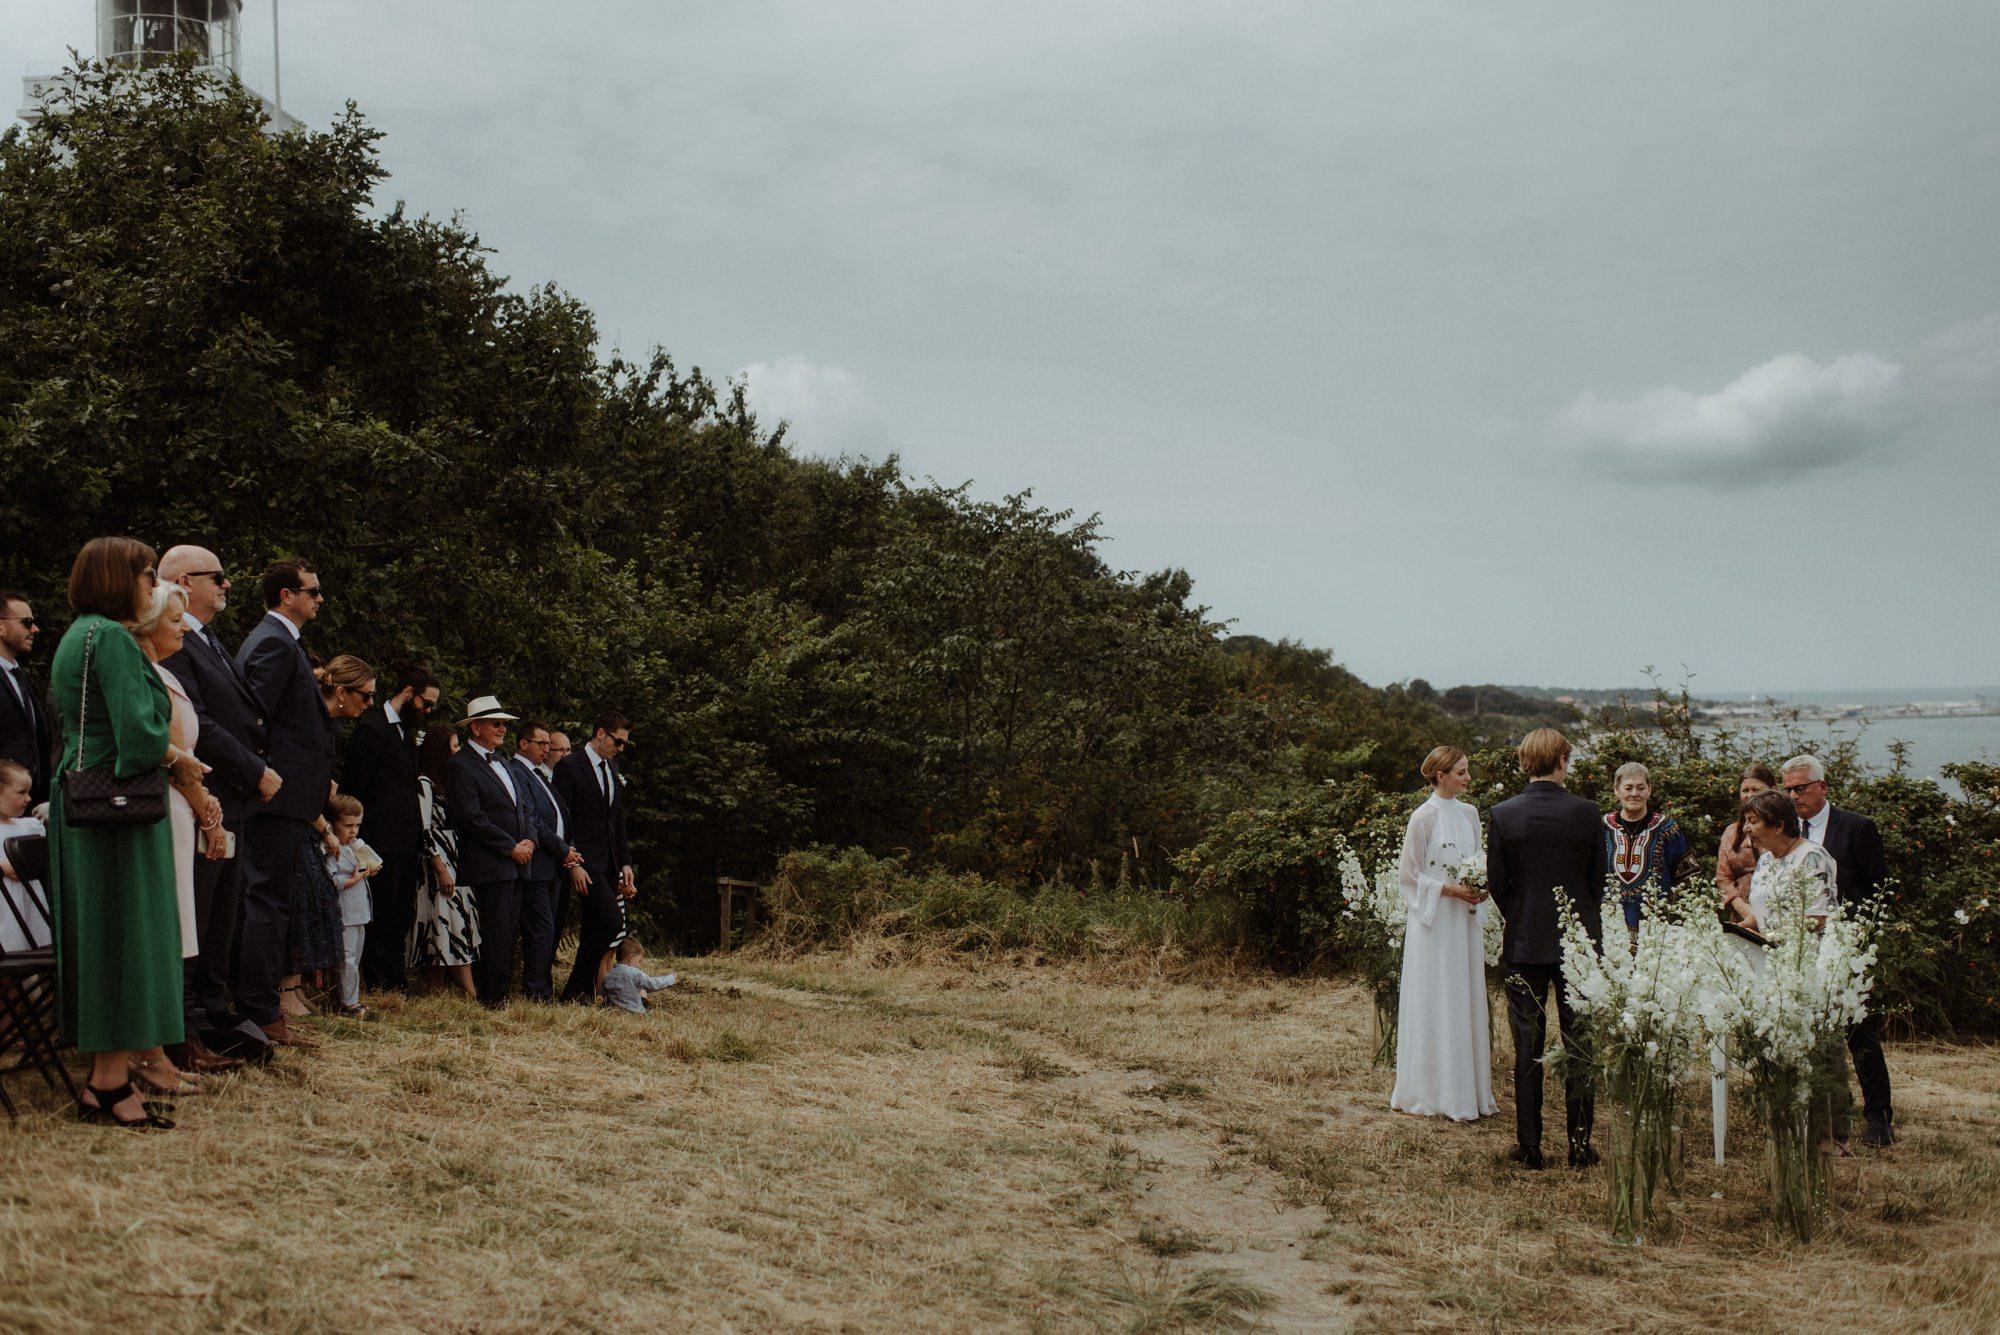 copenhagen wedding photography 0012 1